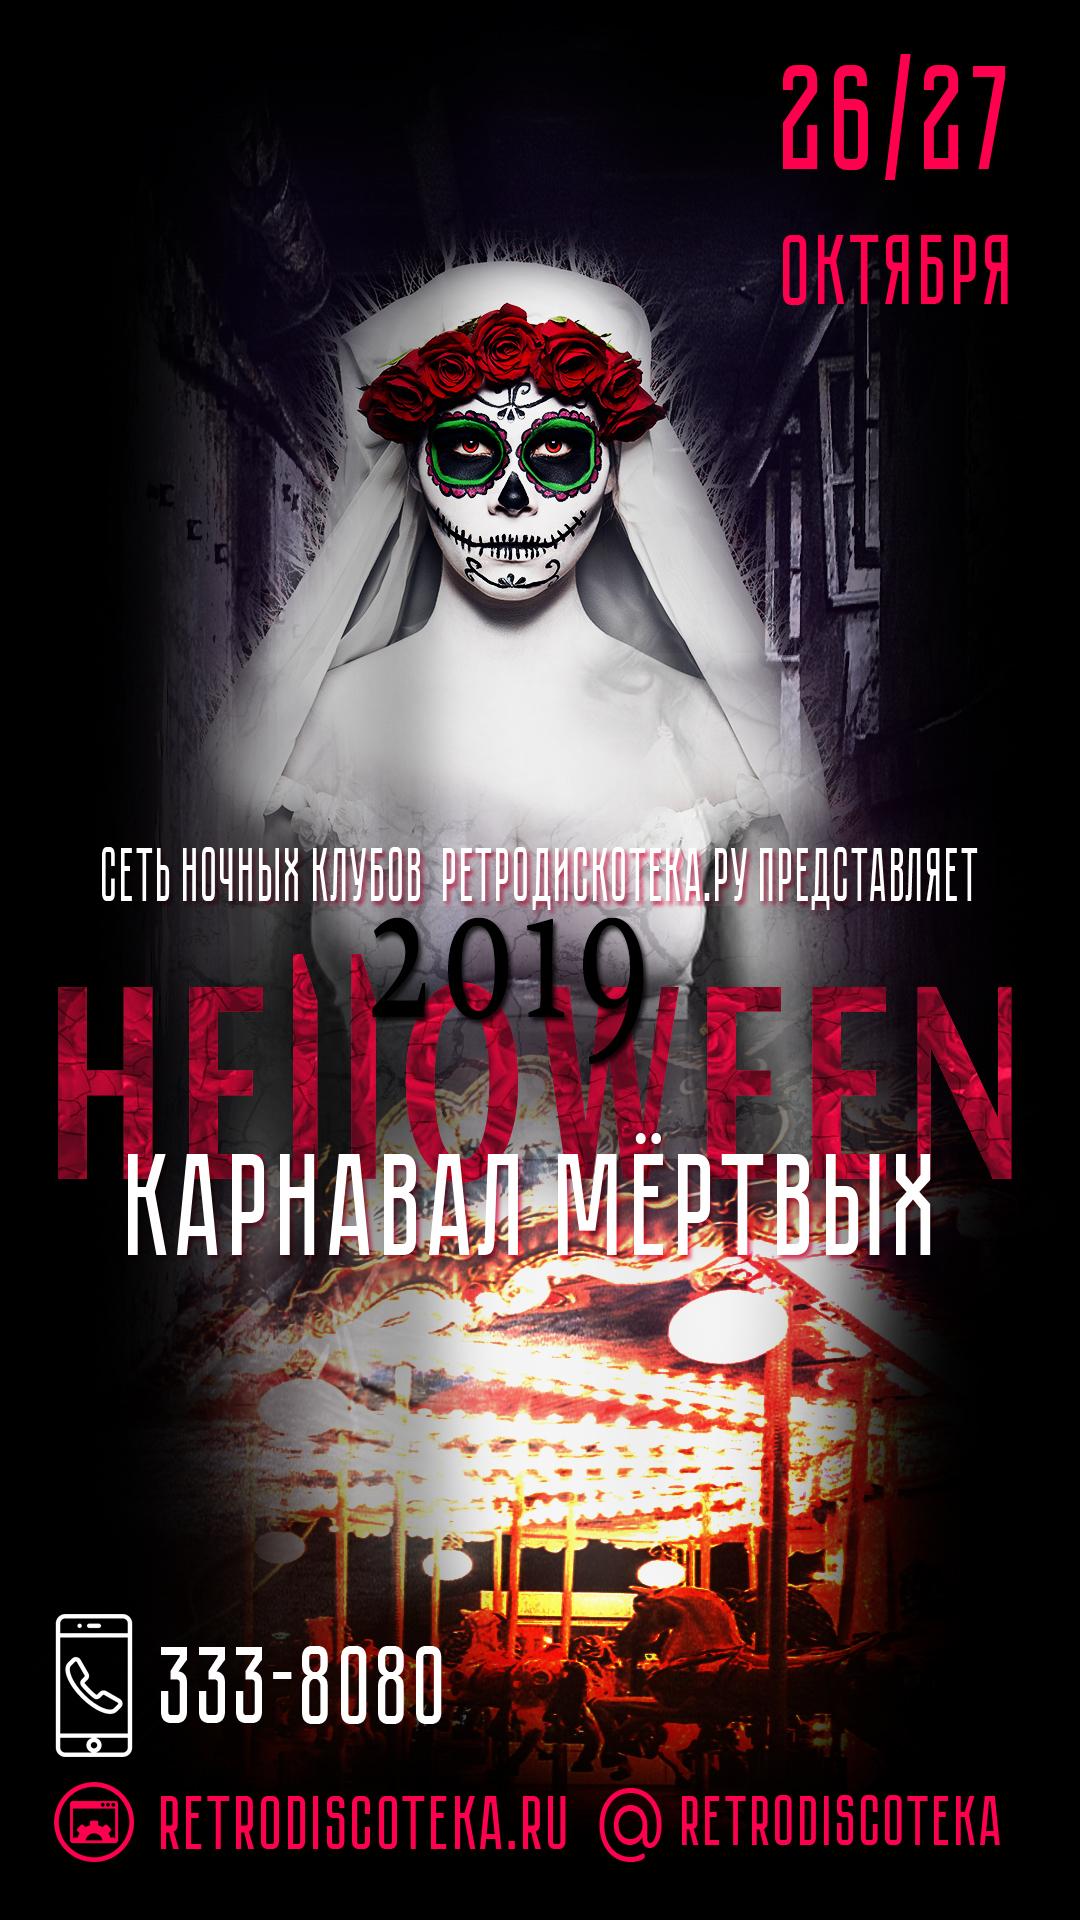 Дизайн афиши Хэллоуин 2019 для сети ночных клубов фото f_2585c6da6ffd7341.jpg